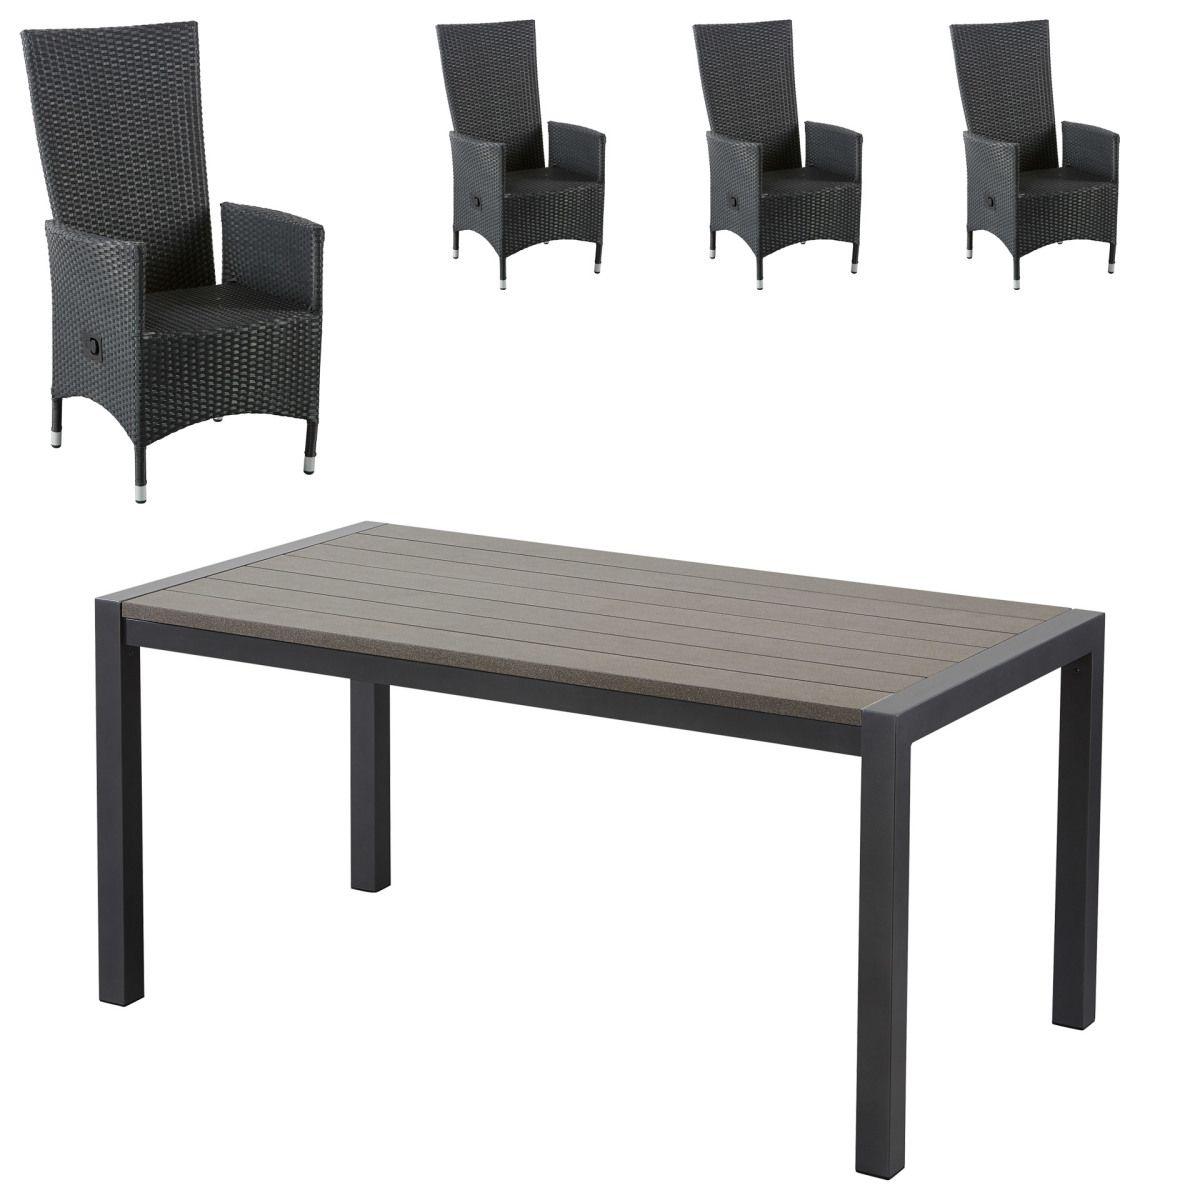 Gartenmöbel Set Antonia/Rio Grande (87,7x158, 4 Stühle) Jetzt